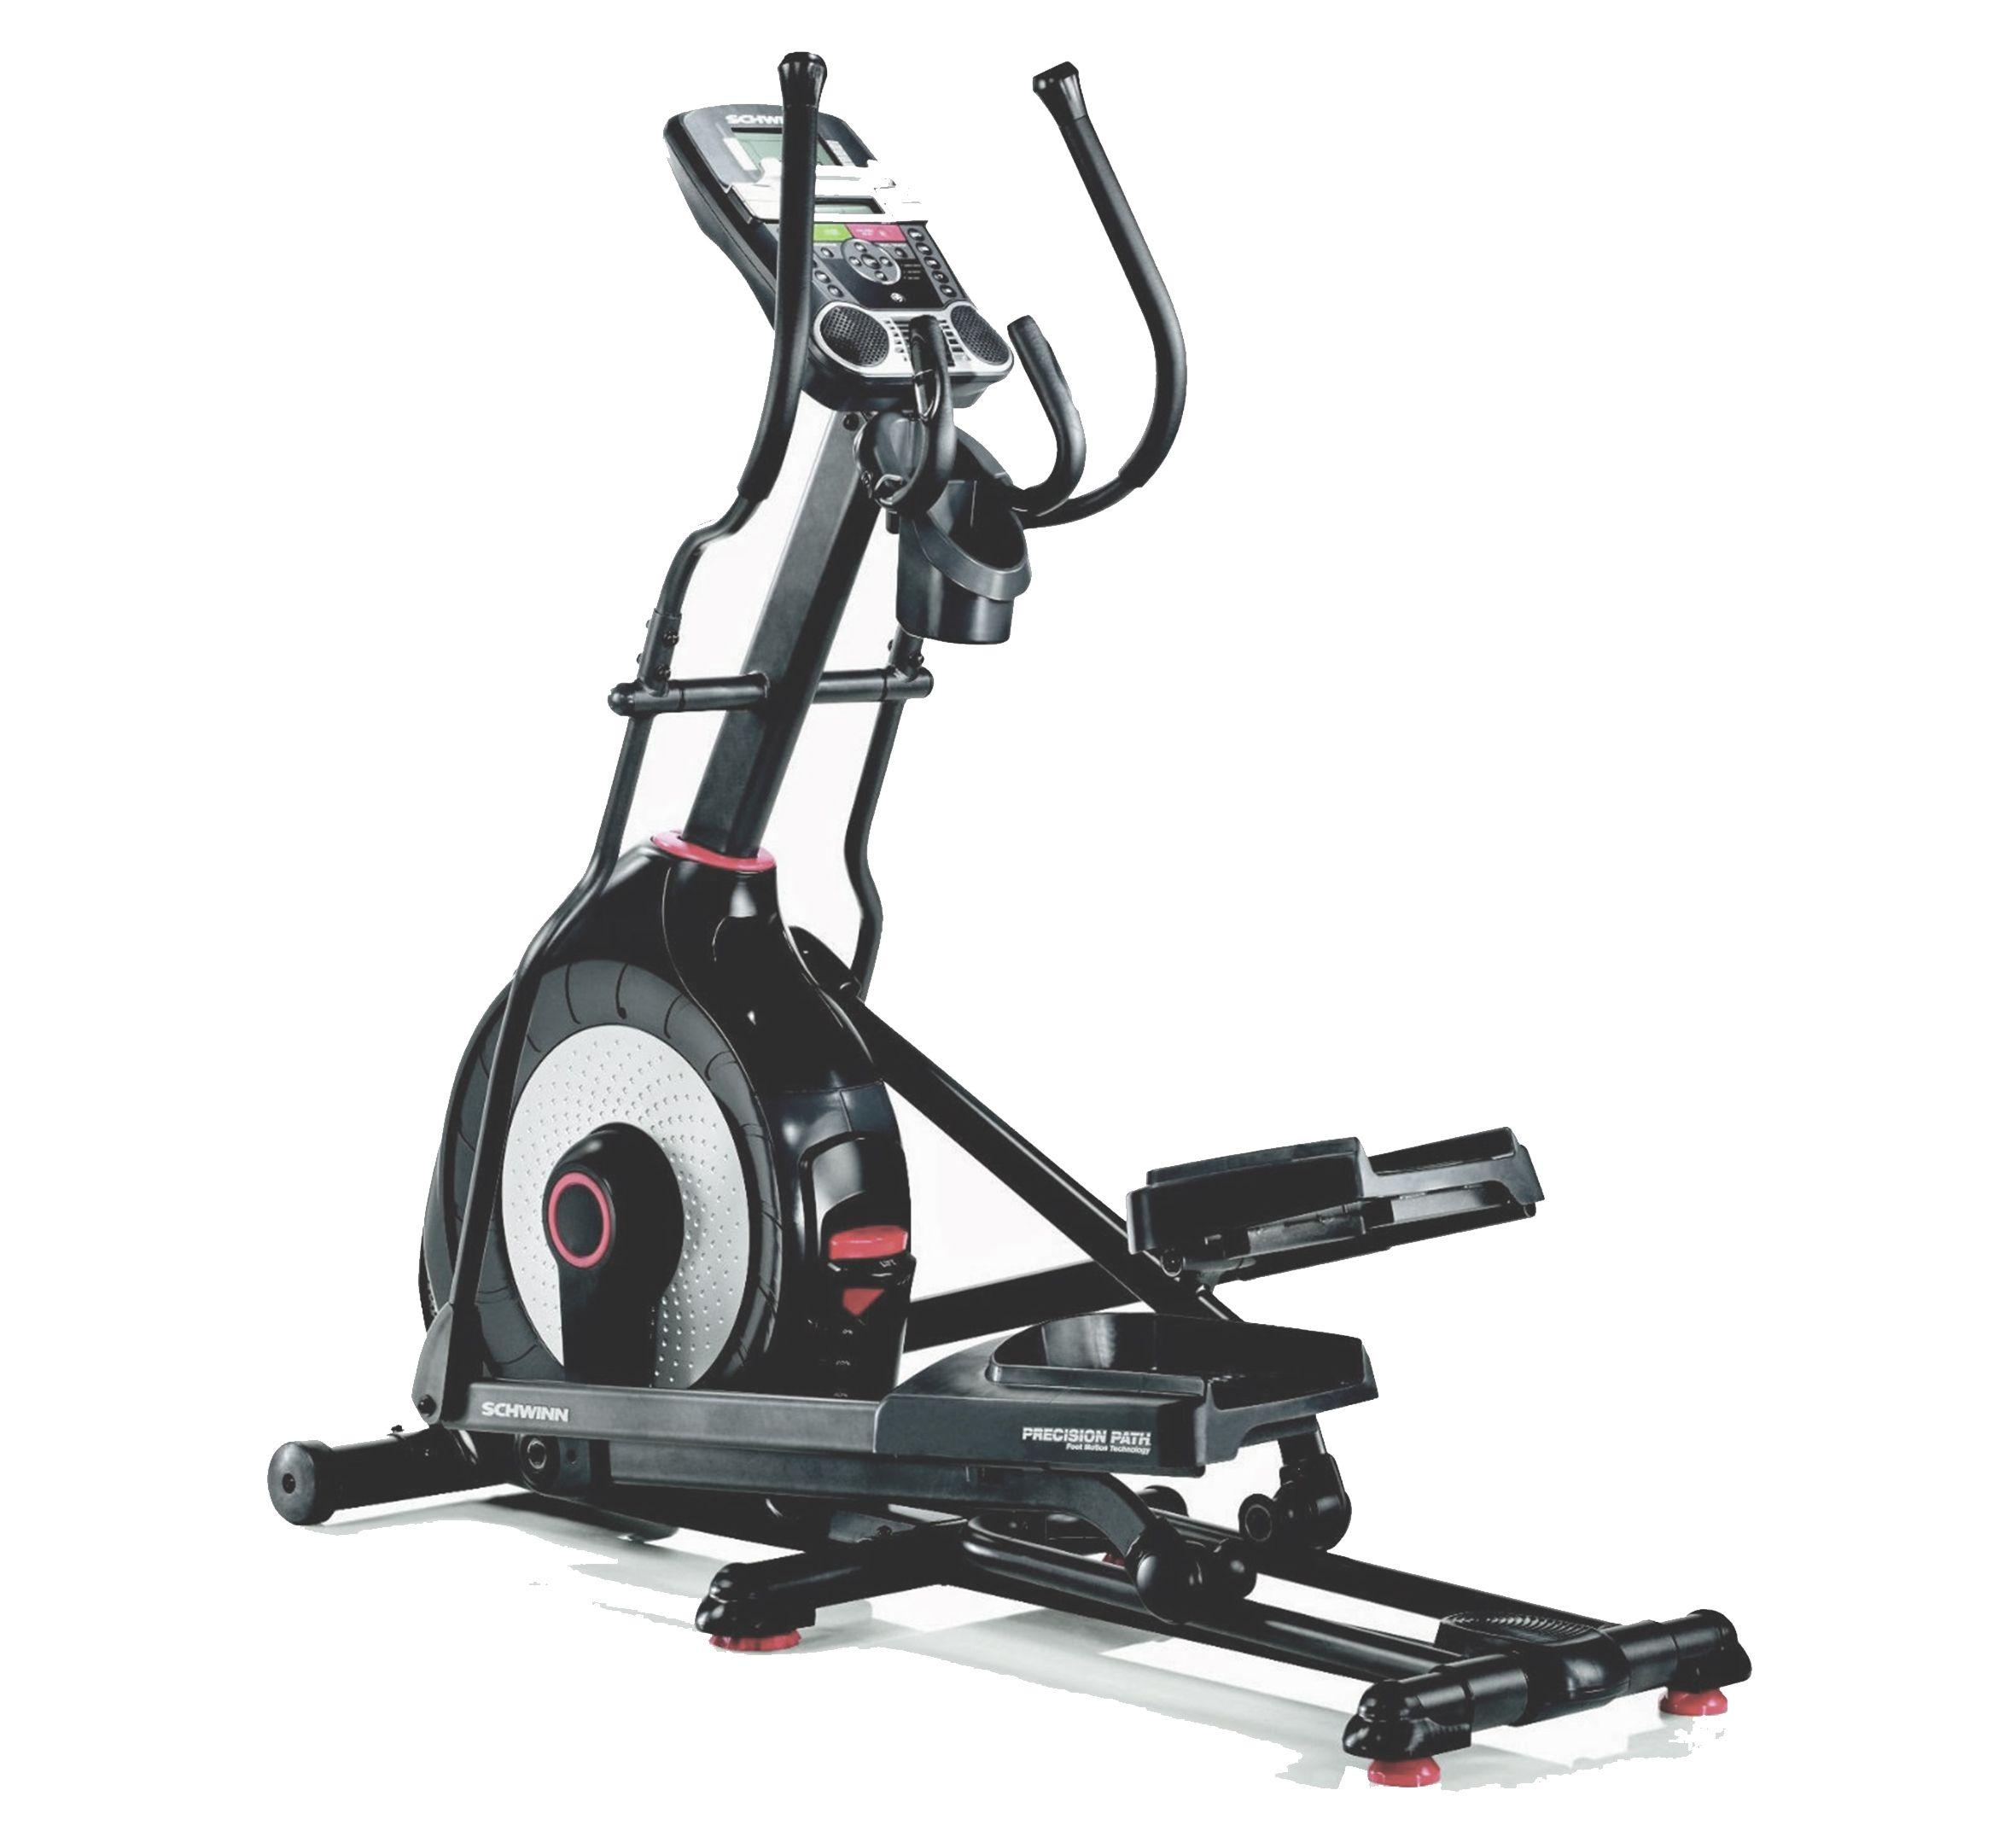 Schwinn 470 Elliptical Workout Machines At Home Gym Elliptical Trainer